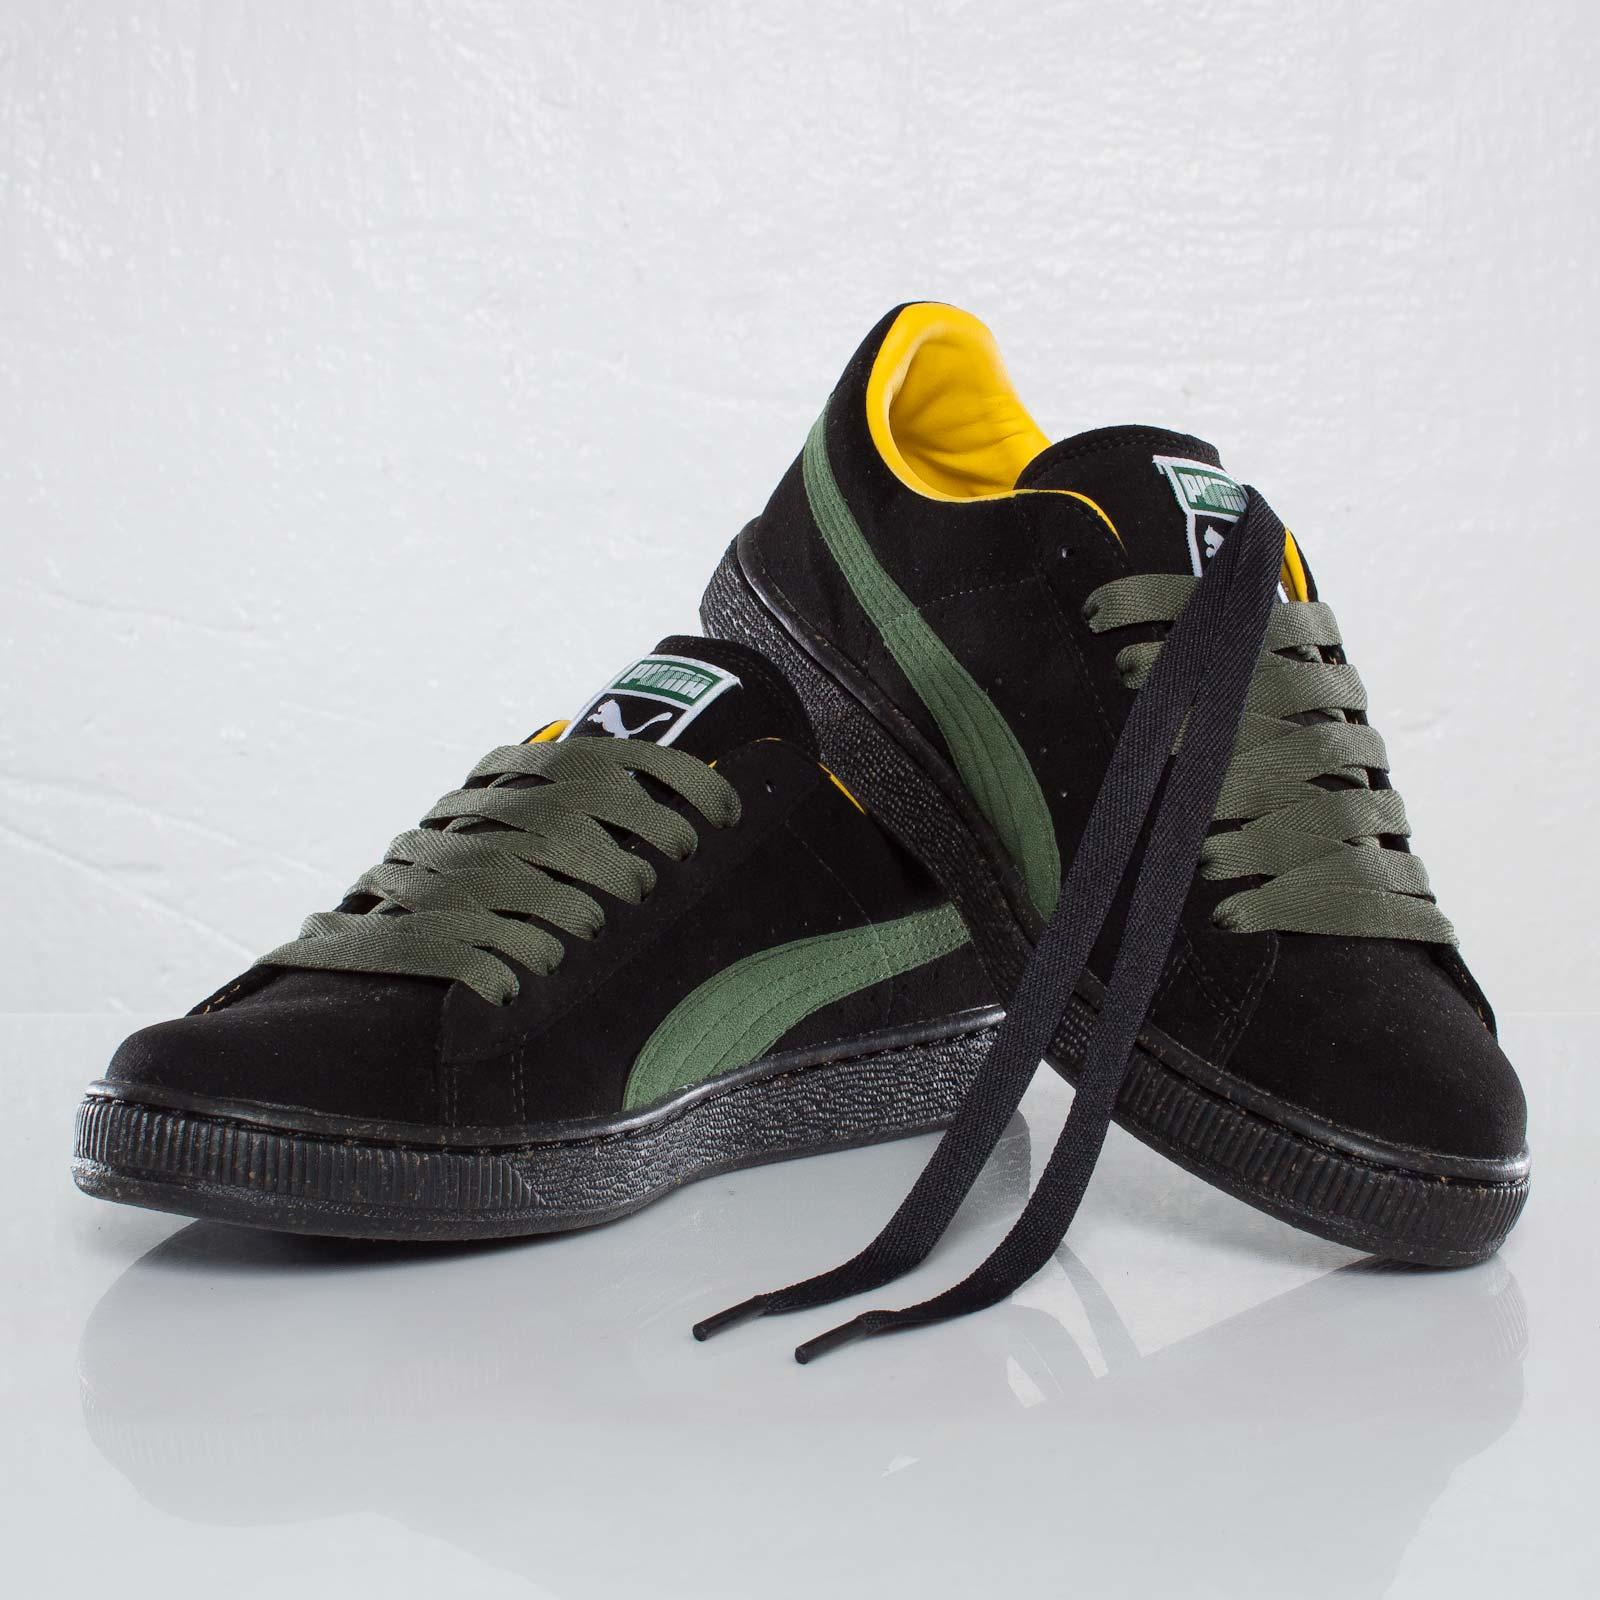 85c3dc8ecbb5 Puma Re-Suede - 111203 - Sneakersnstuff